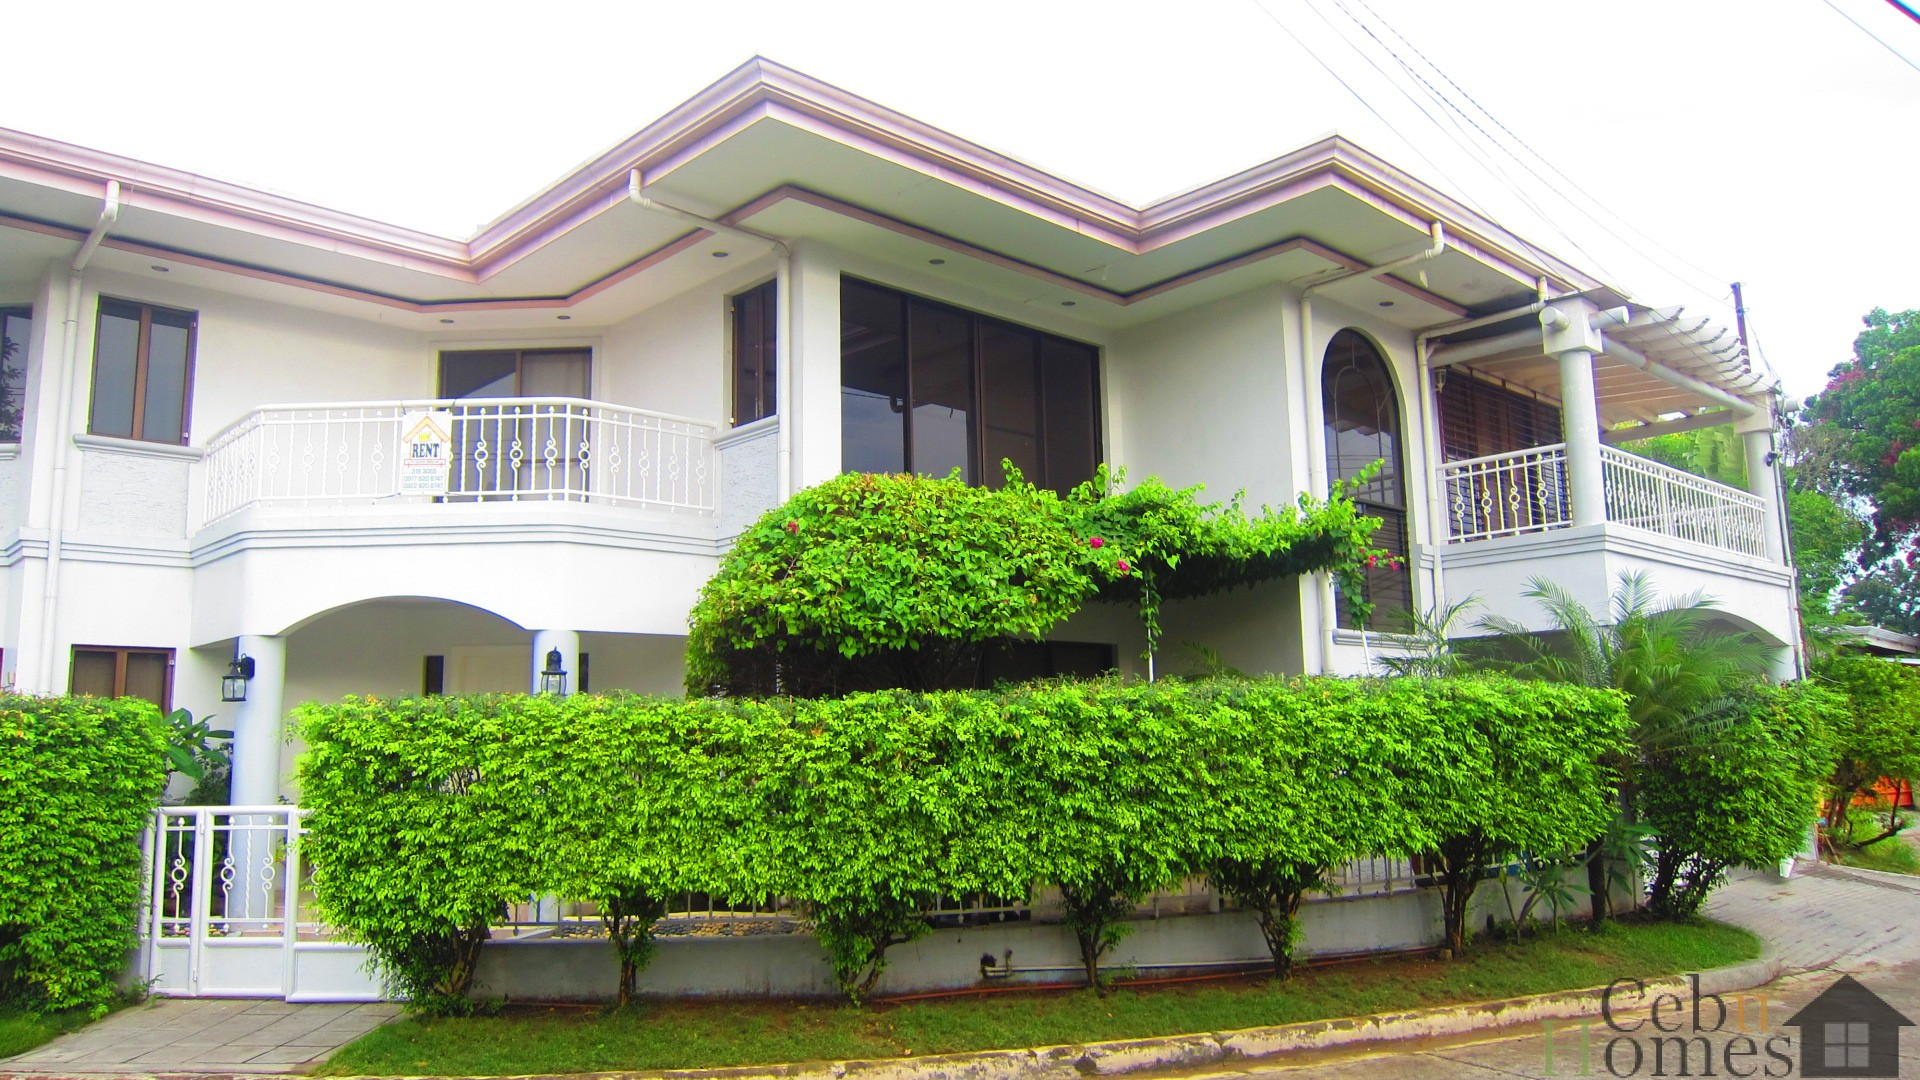 #0026 Spacious 4-Bedroom House in Banilad